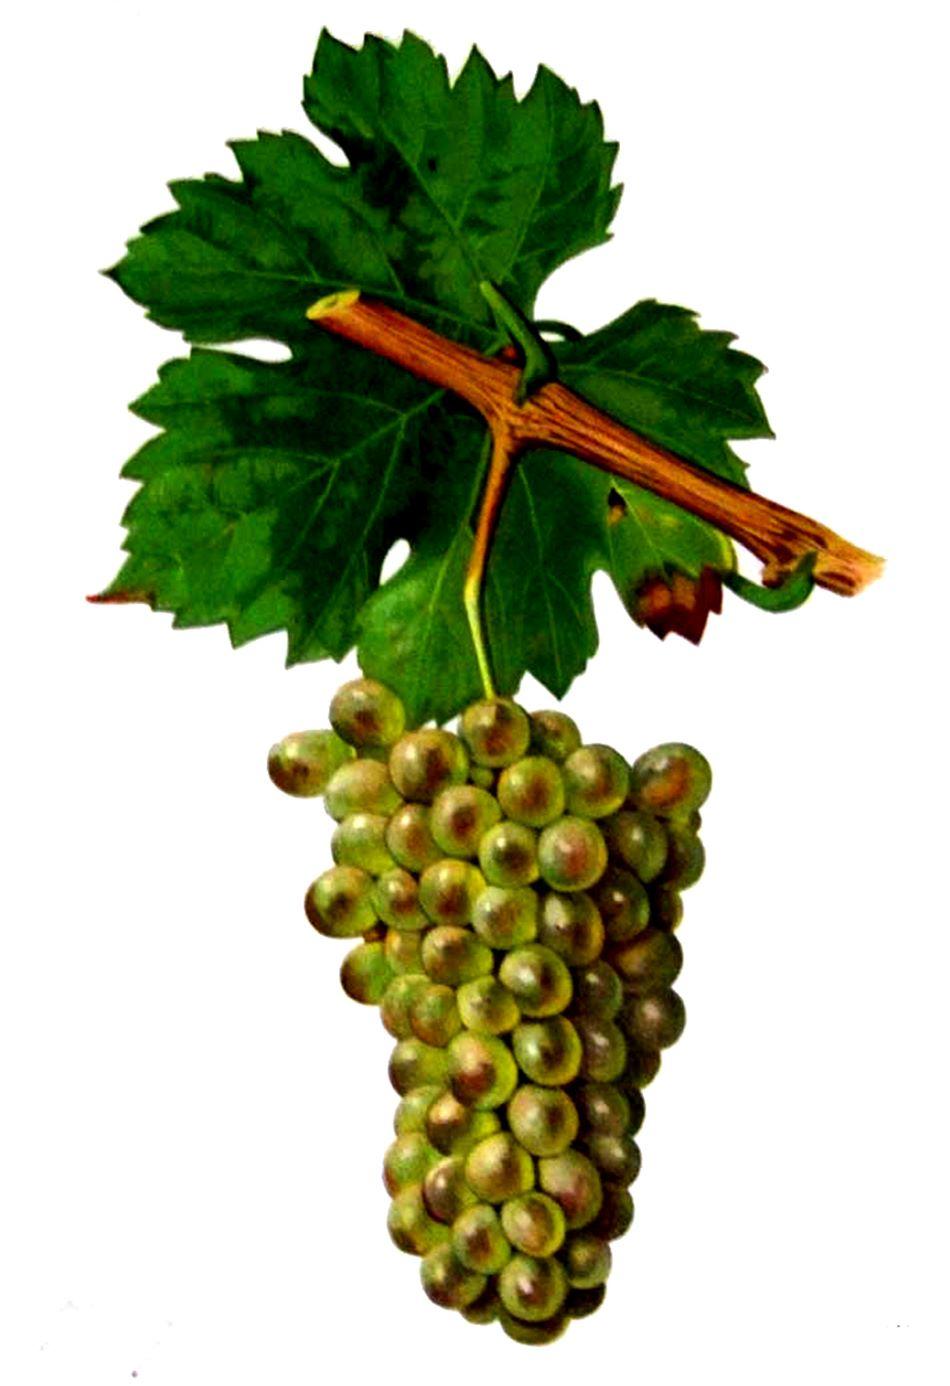 Hrozny odrůdy Mondeuse Blanche, Viala et Vermorel [Public domain].